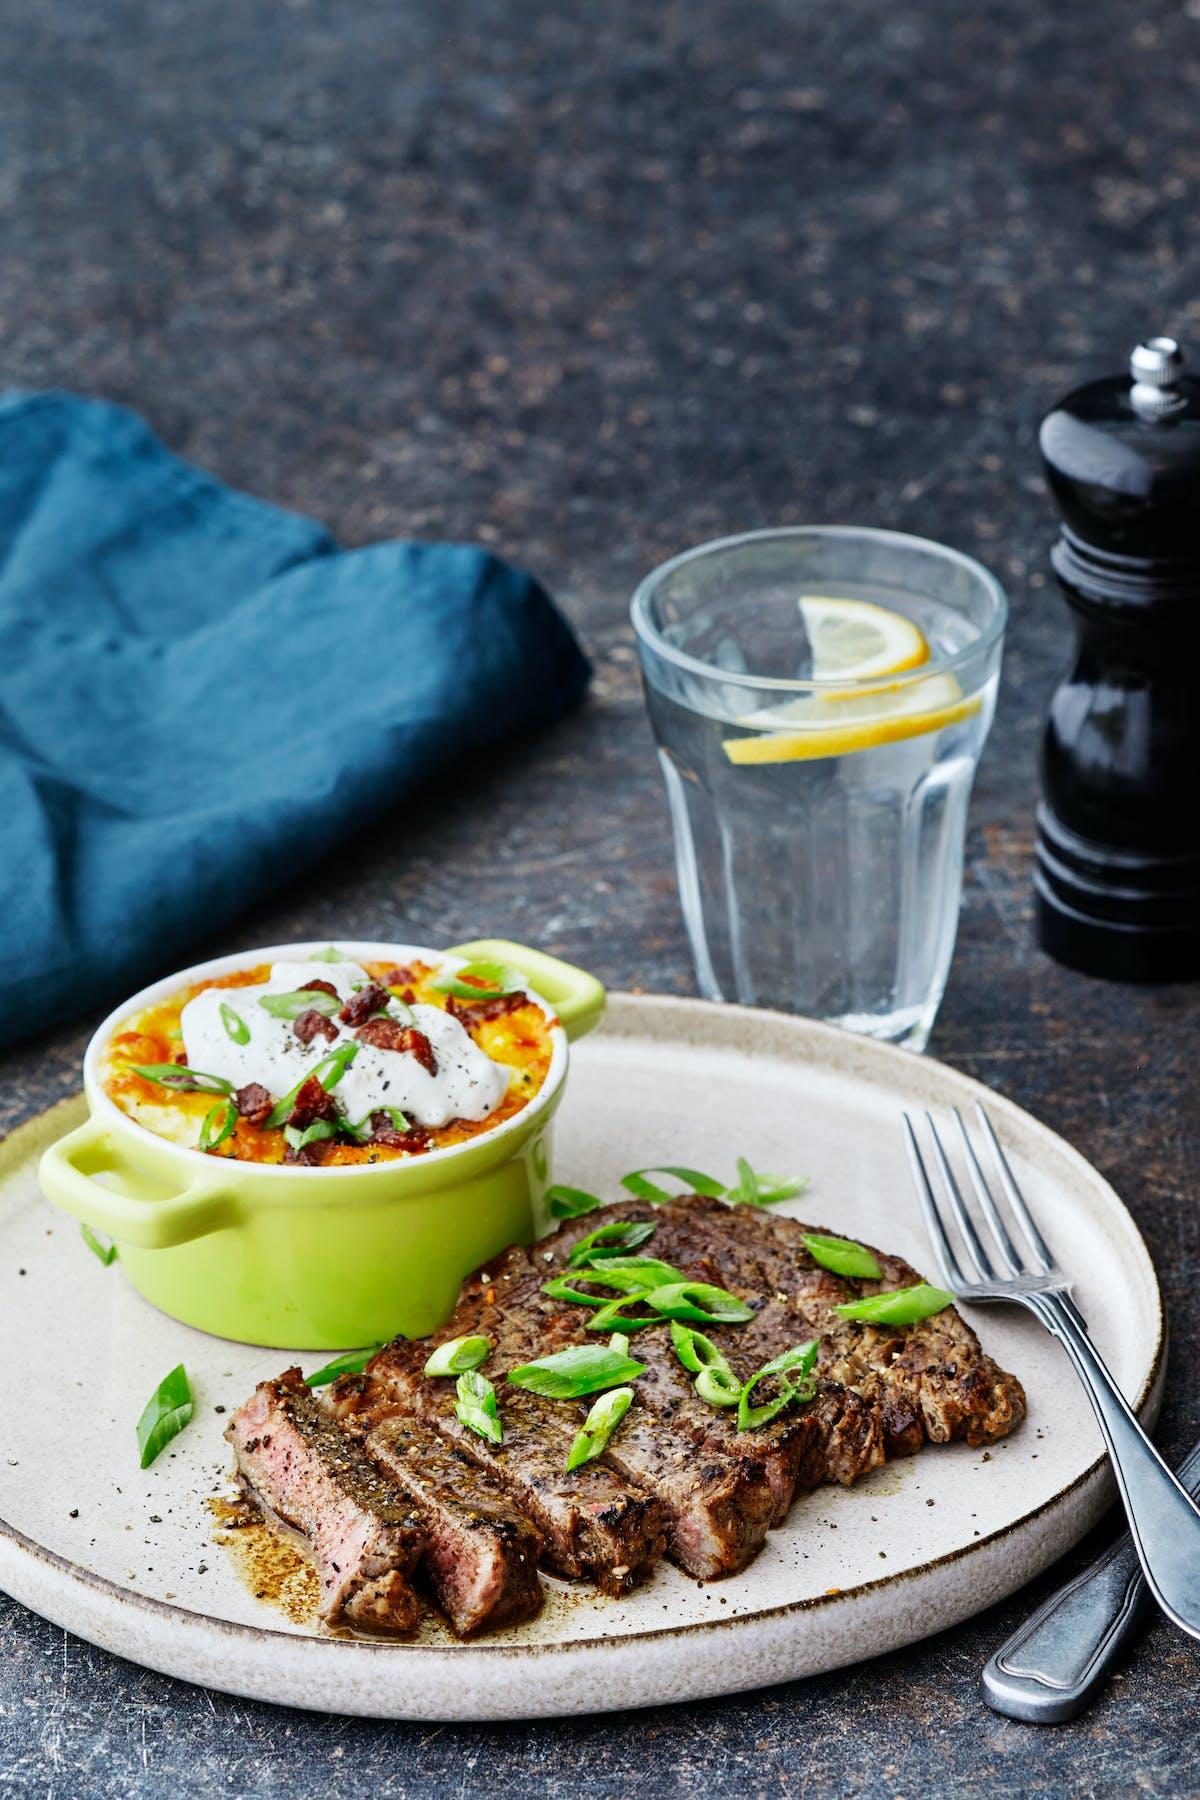 Ribeye steak with loaded cauliflower mash